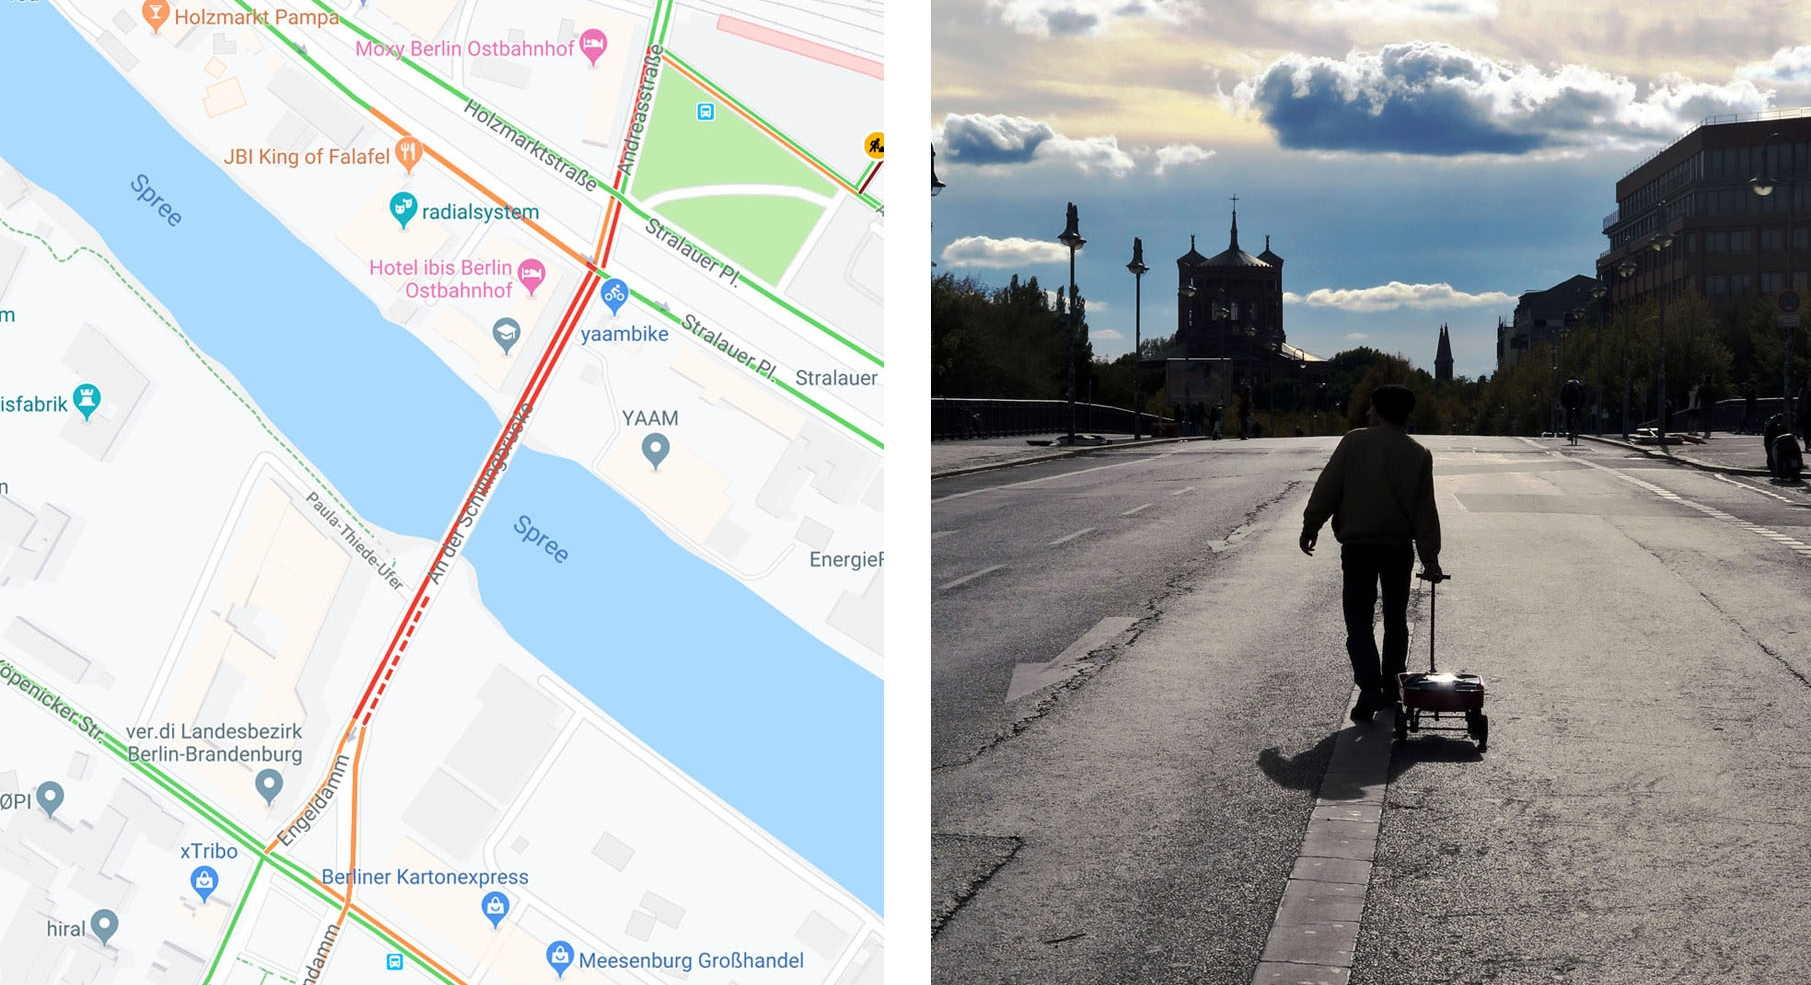 Artist lugs around wagon full of phones to create virtual traffic jams in Google Maps